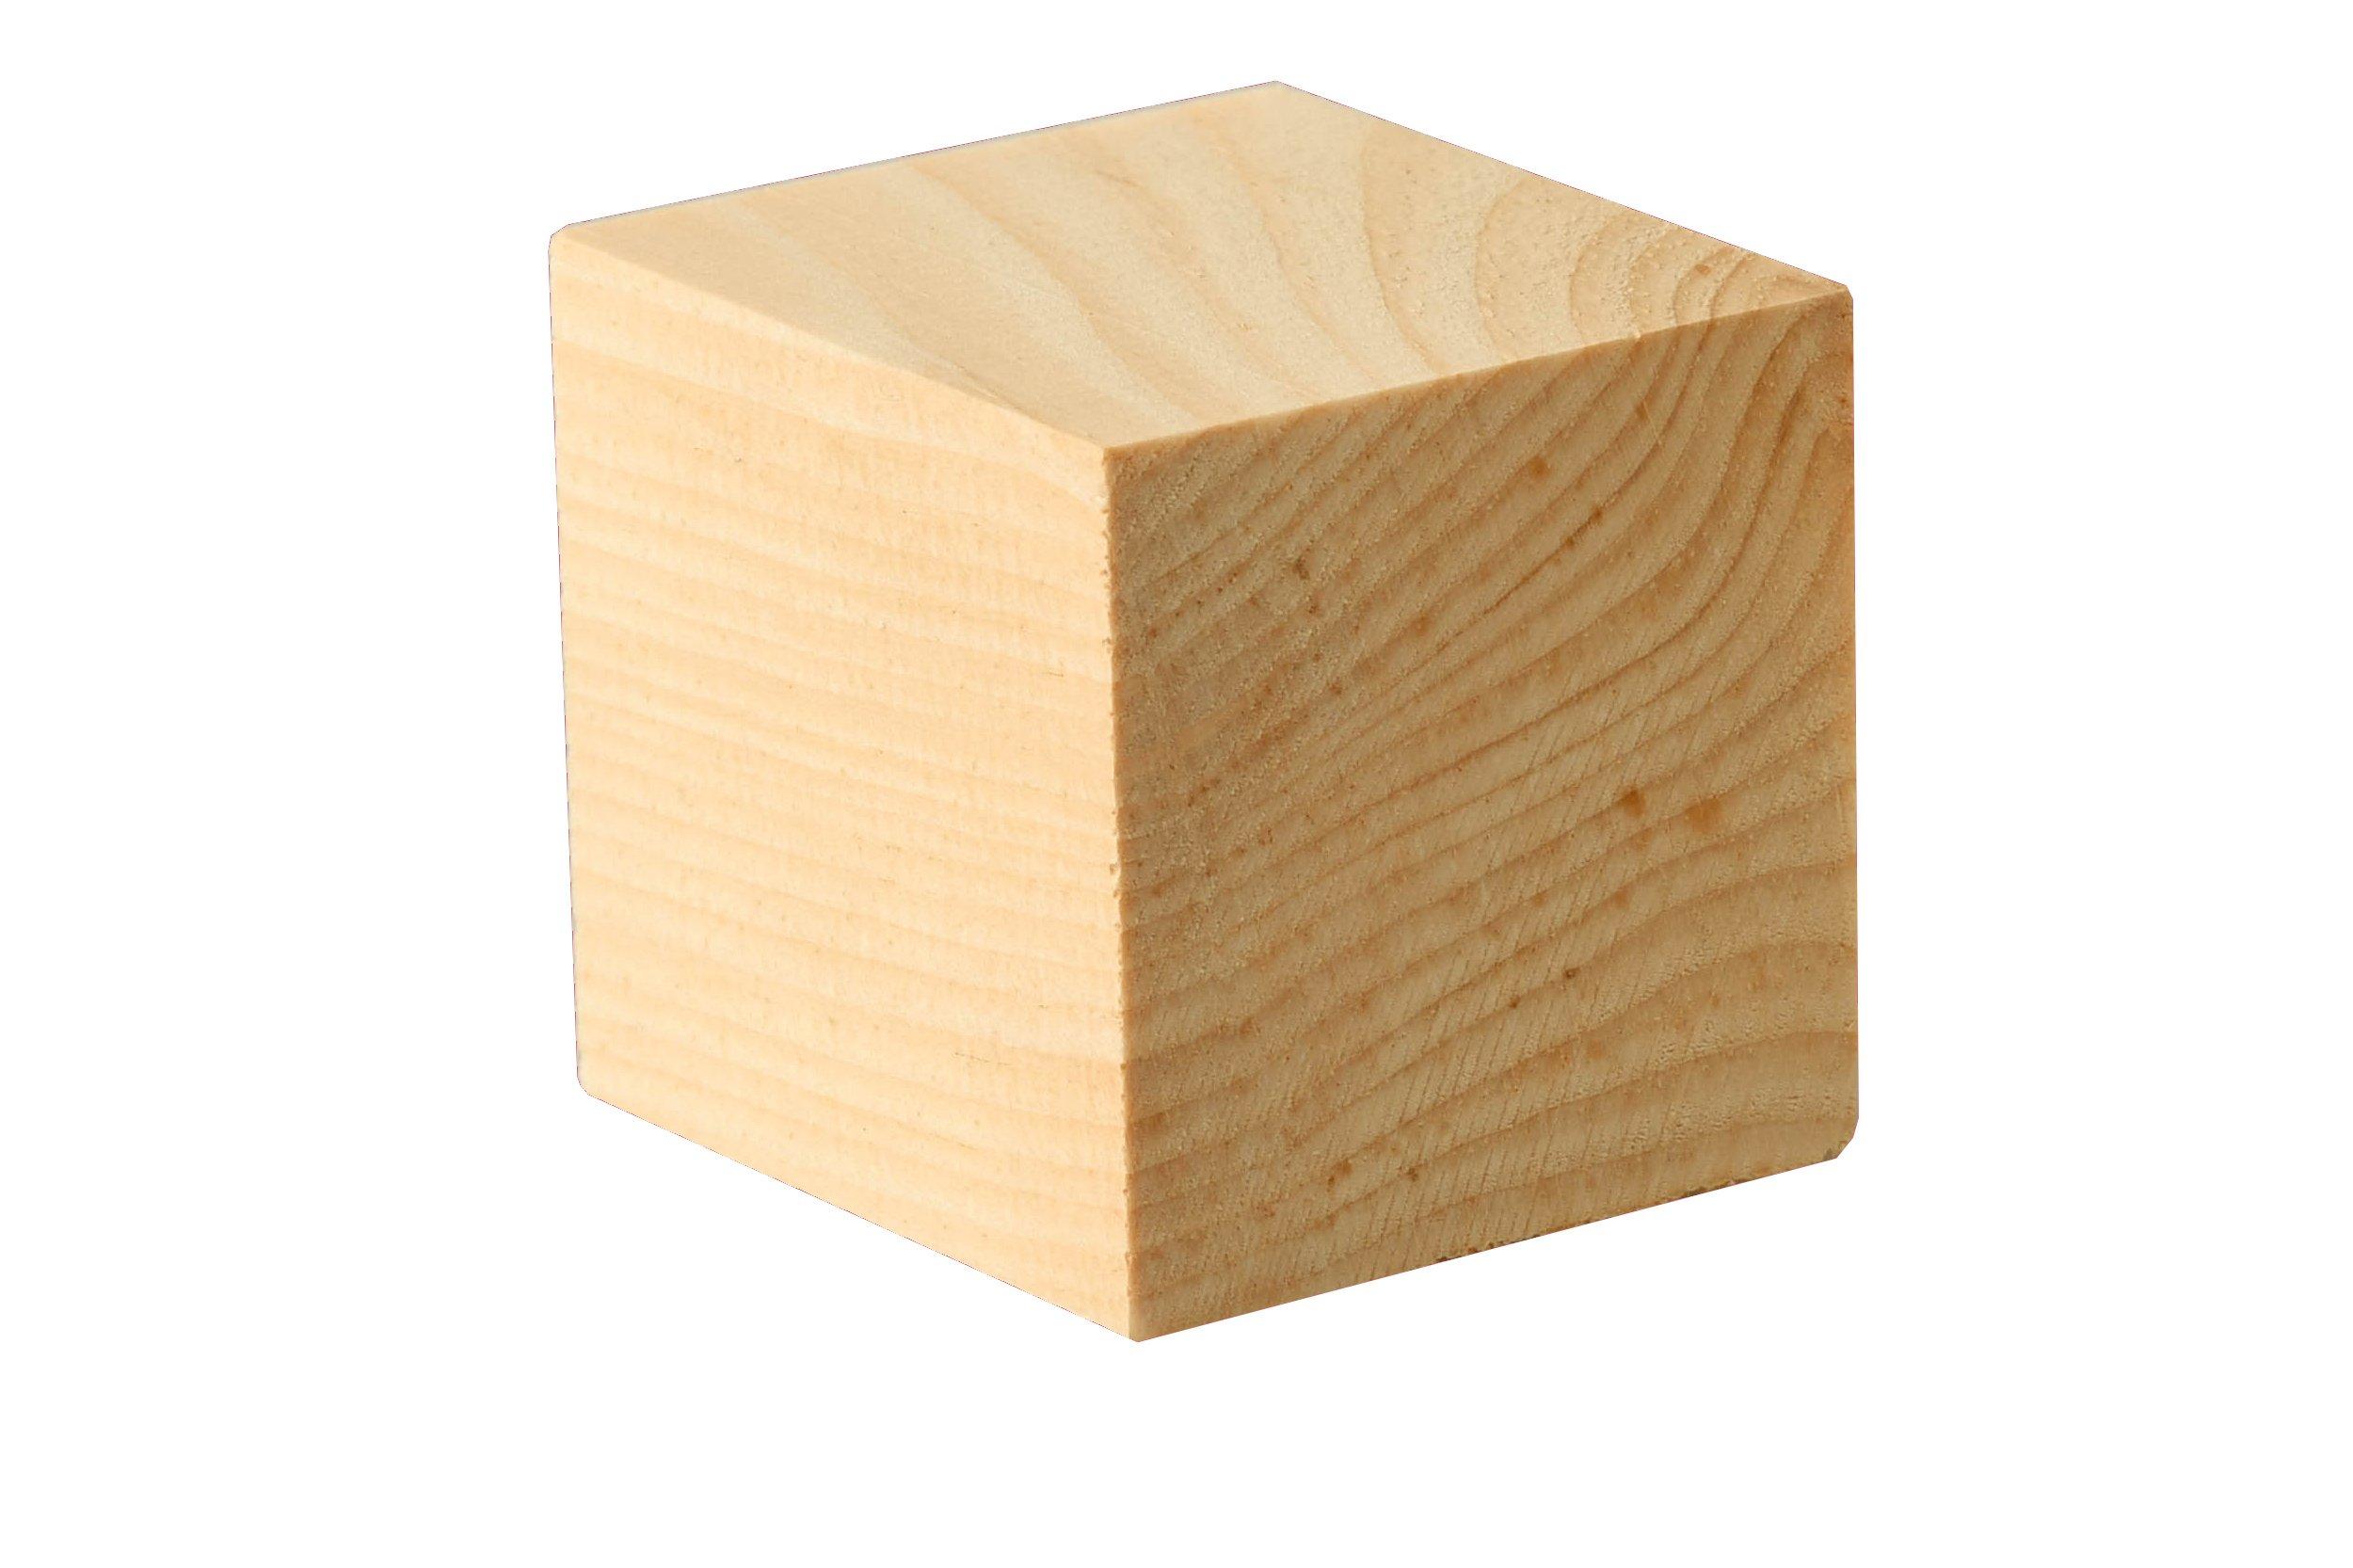 Holzwürfel Zirbe - 20er Pkg., 4,2x4,2x4,2 cm